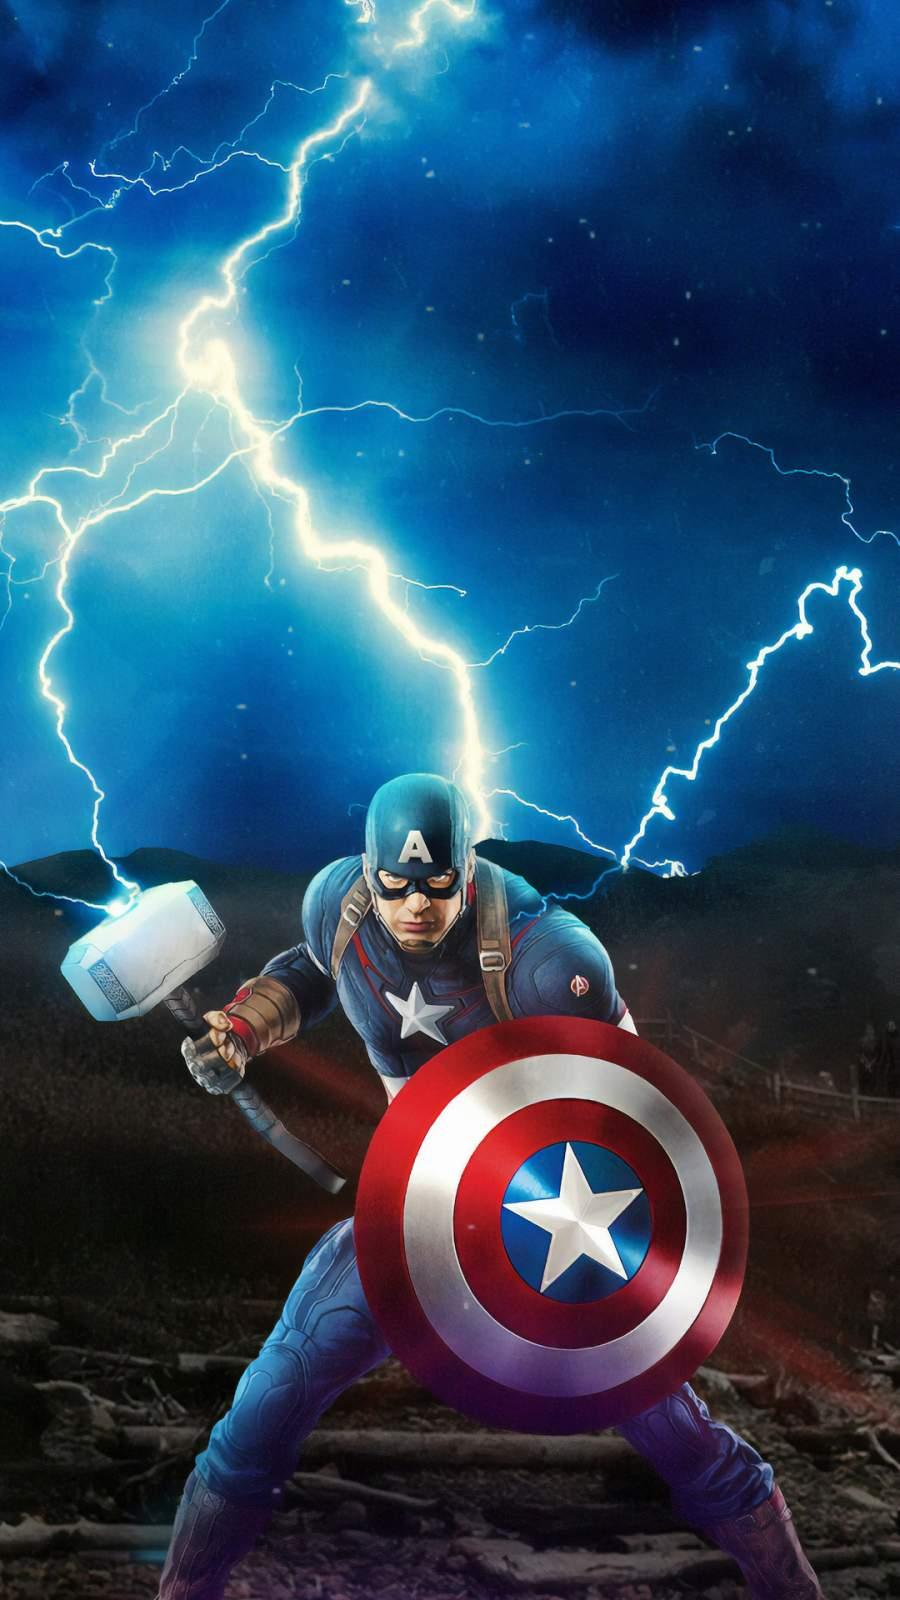 Captain America Mjolnir Avengers iPhone Wallpaper - iPhone ...